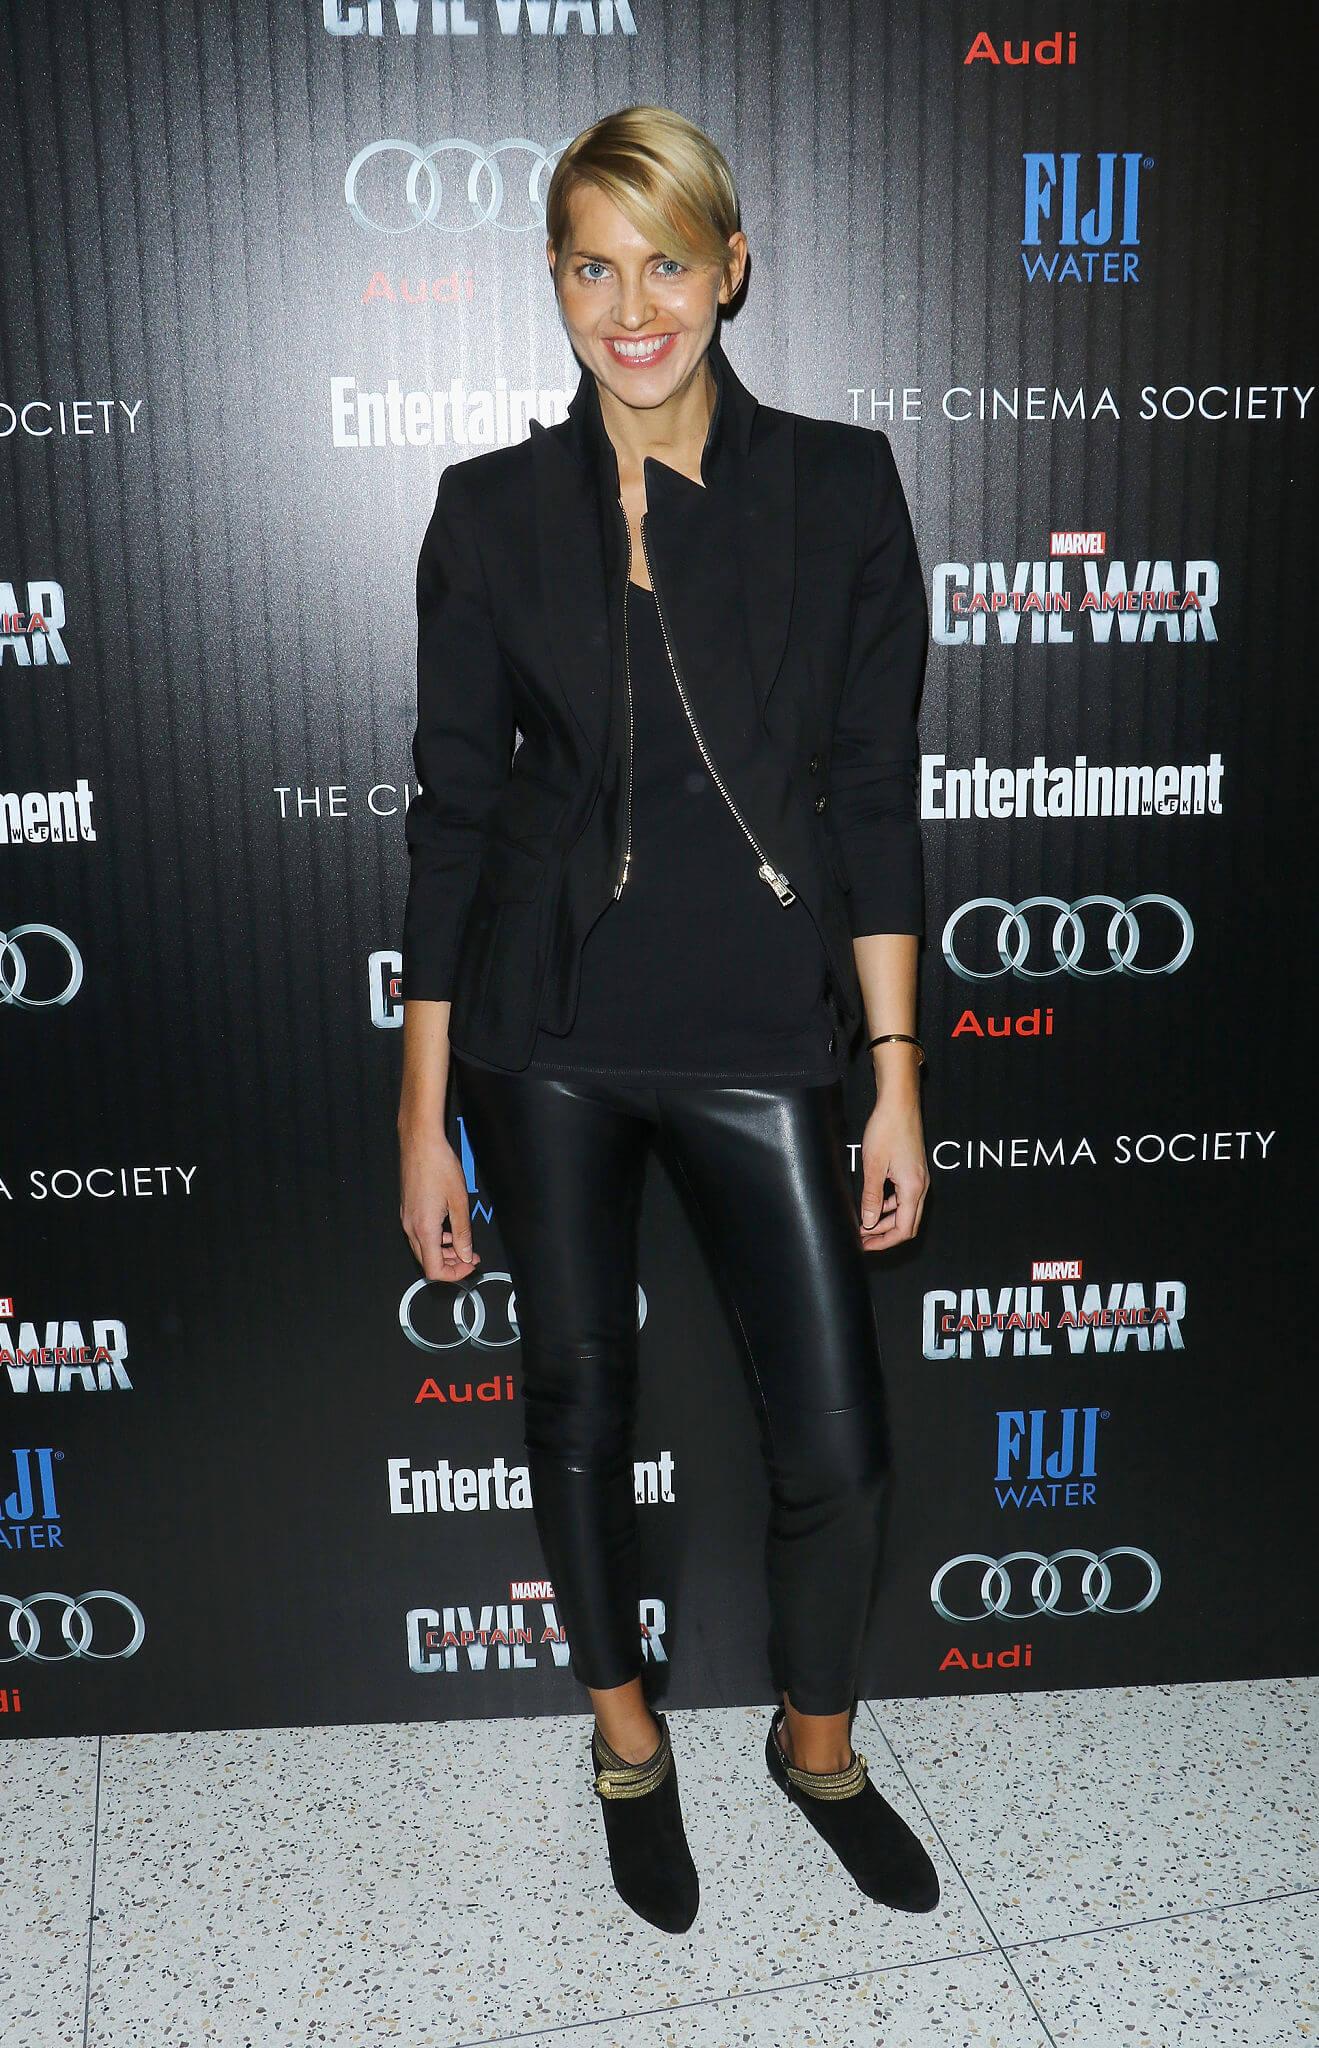 Genevieve Bahrenburg attends the screening of Captain America: Civil War